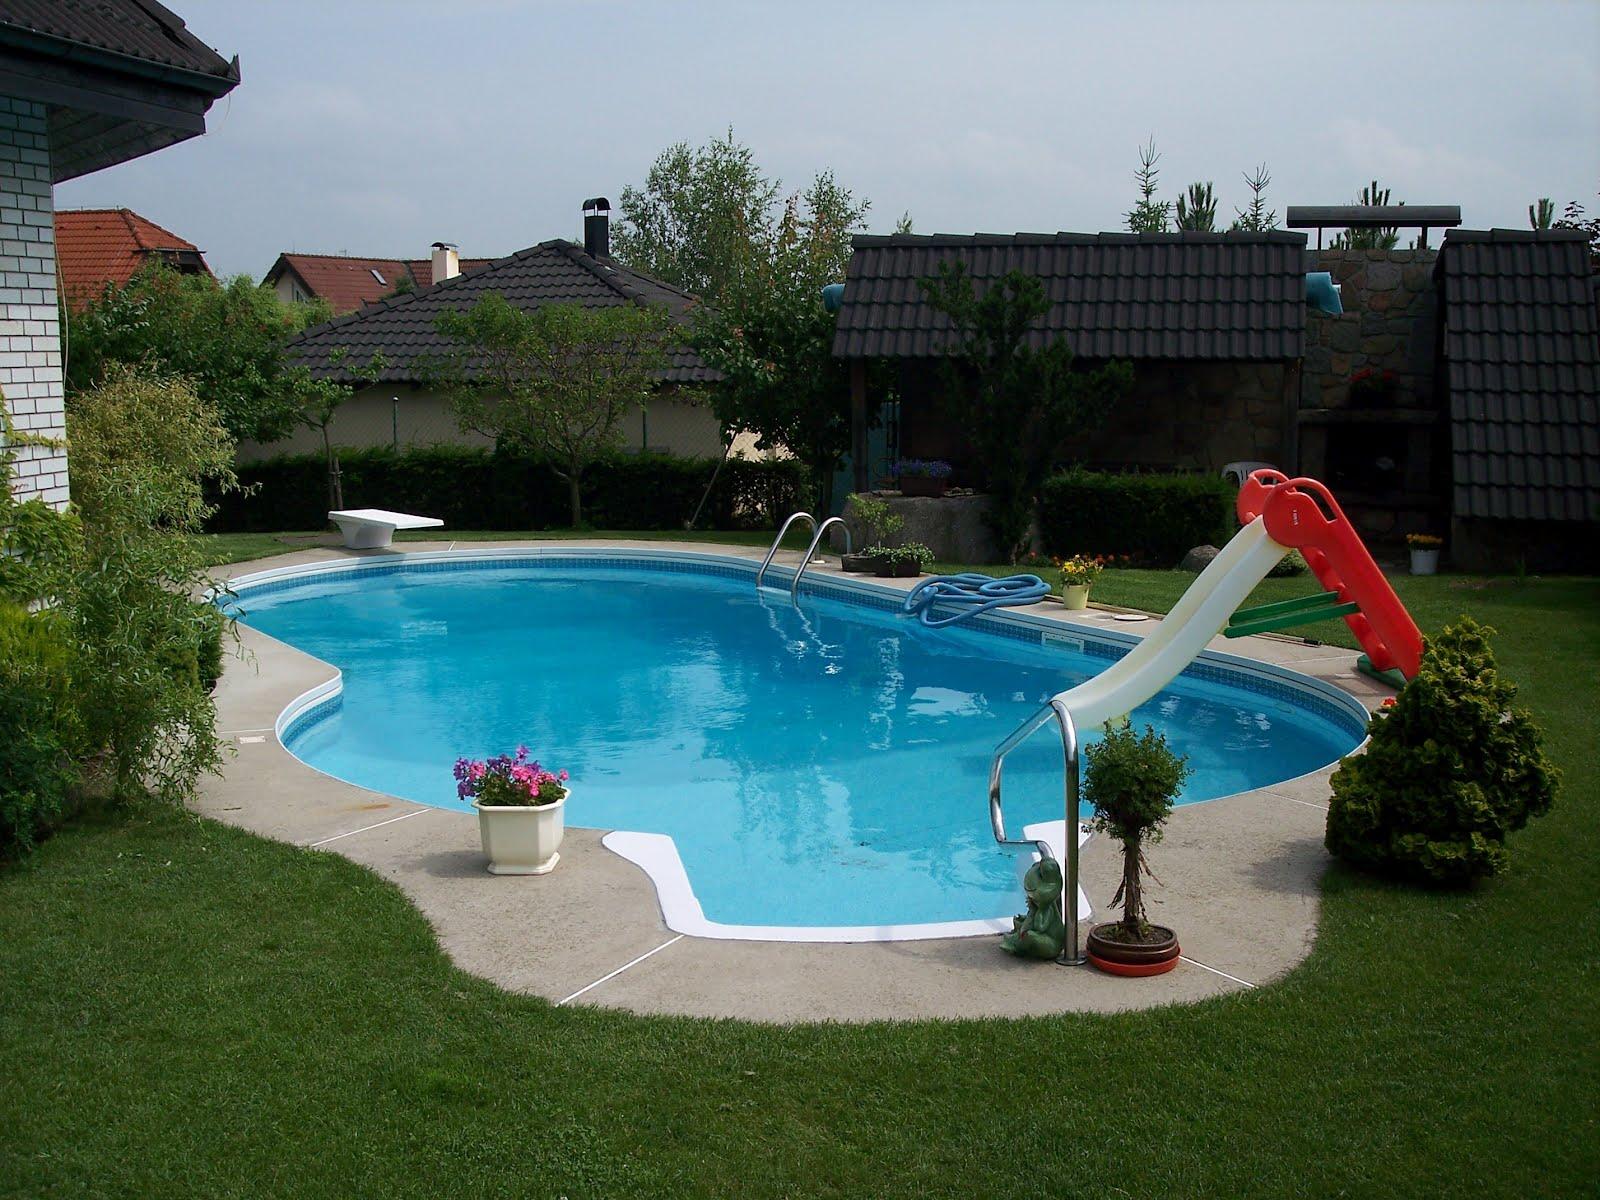 Lugares y centros tur sticos para visitar piscinas mas for Mas piscinas